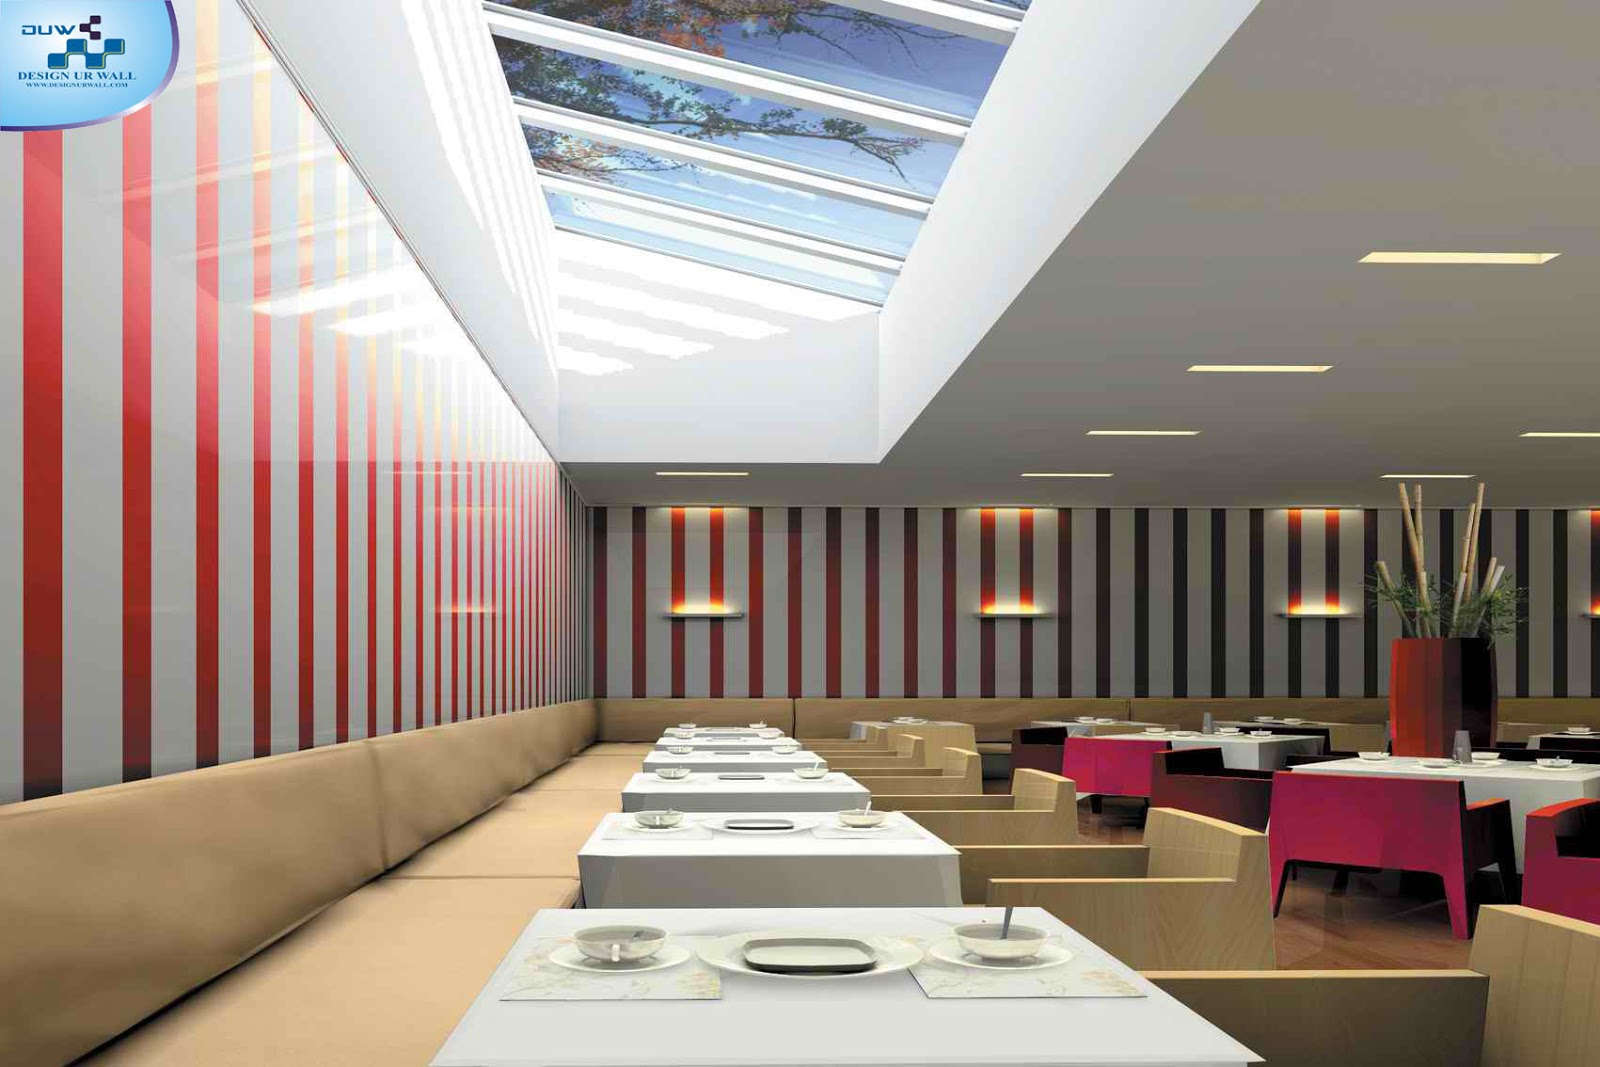 Restaurant Kitchen Wall Panels imported wallpaper merchant: pvc panel;pvc wall panels;decorative